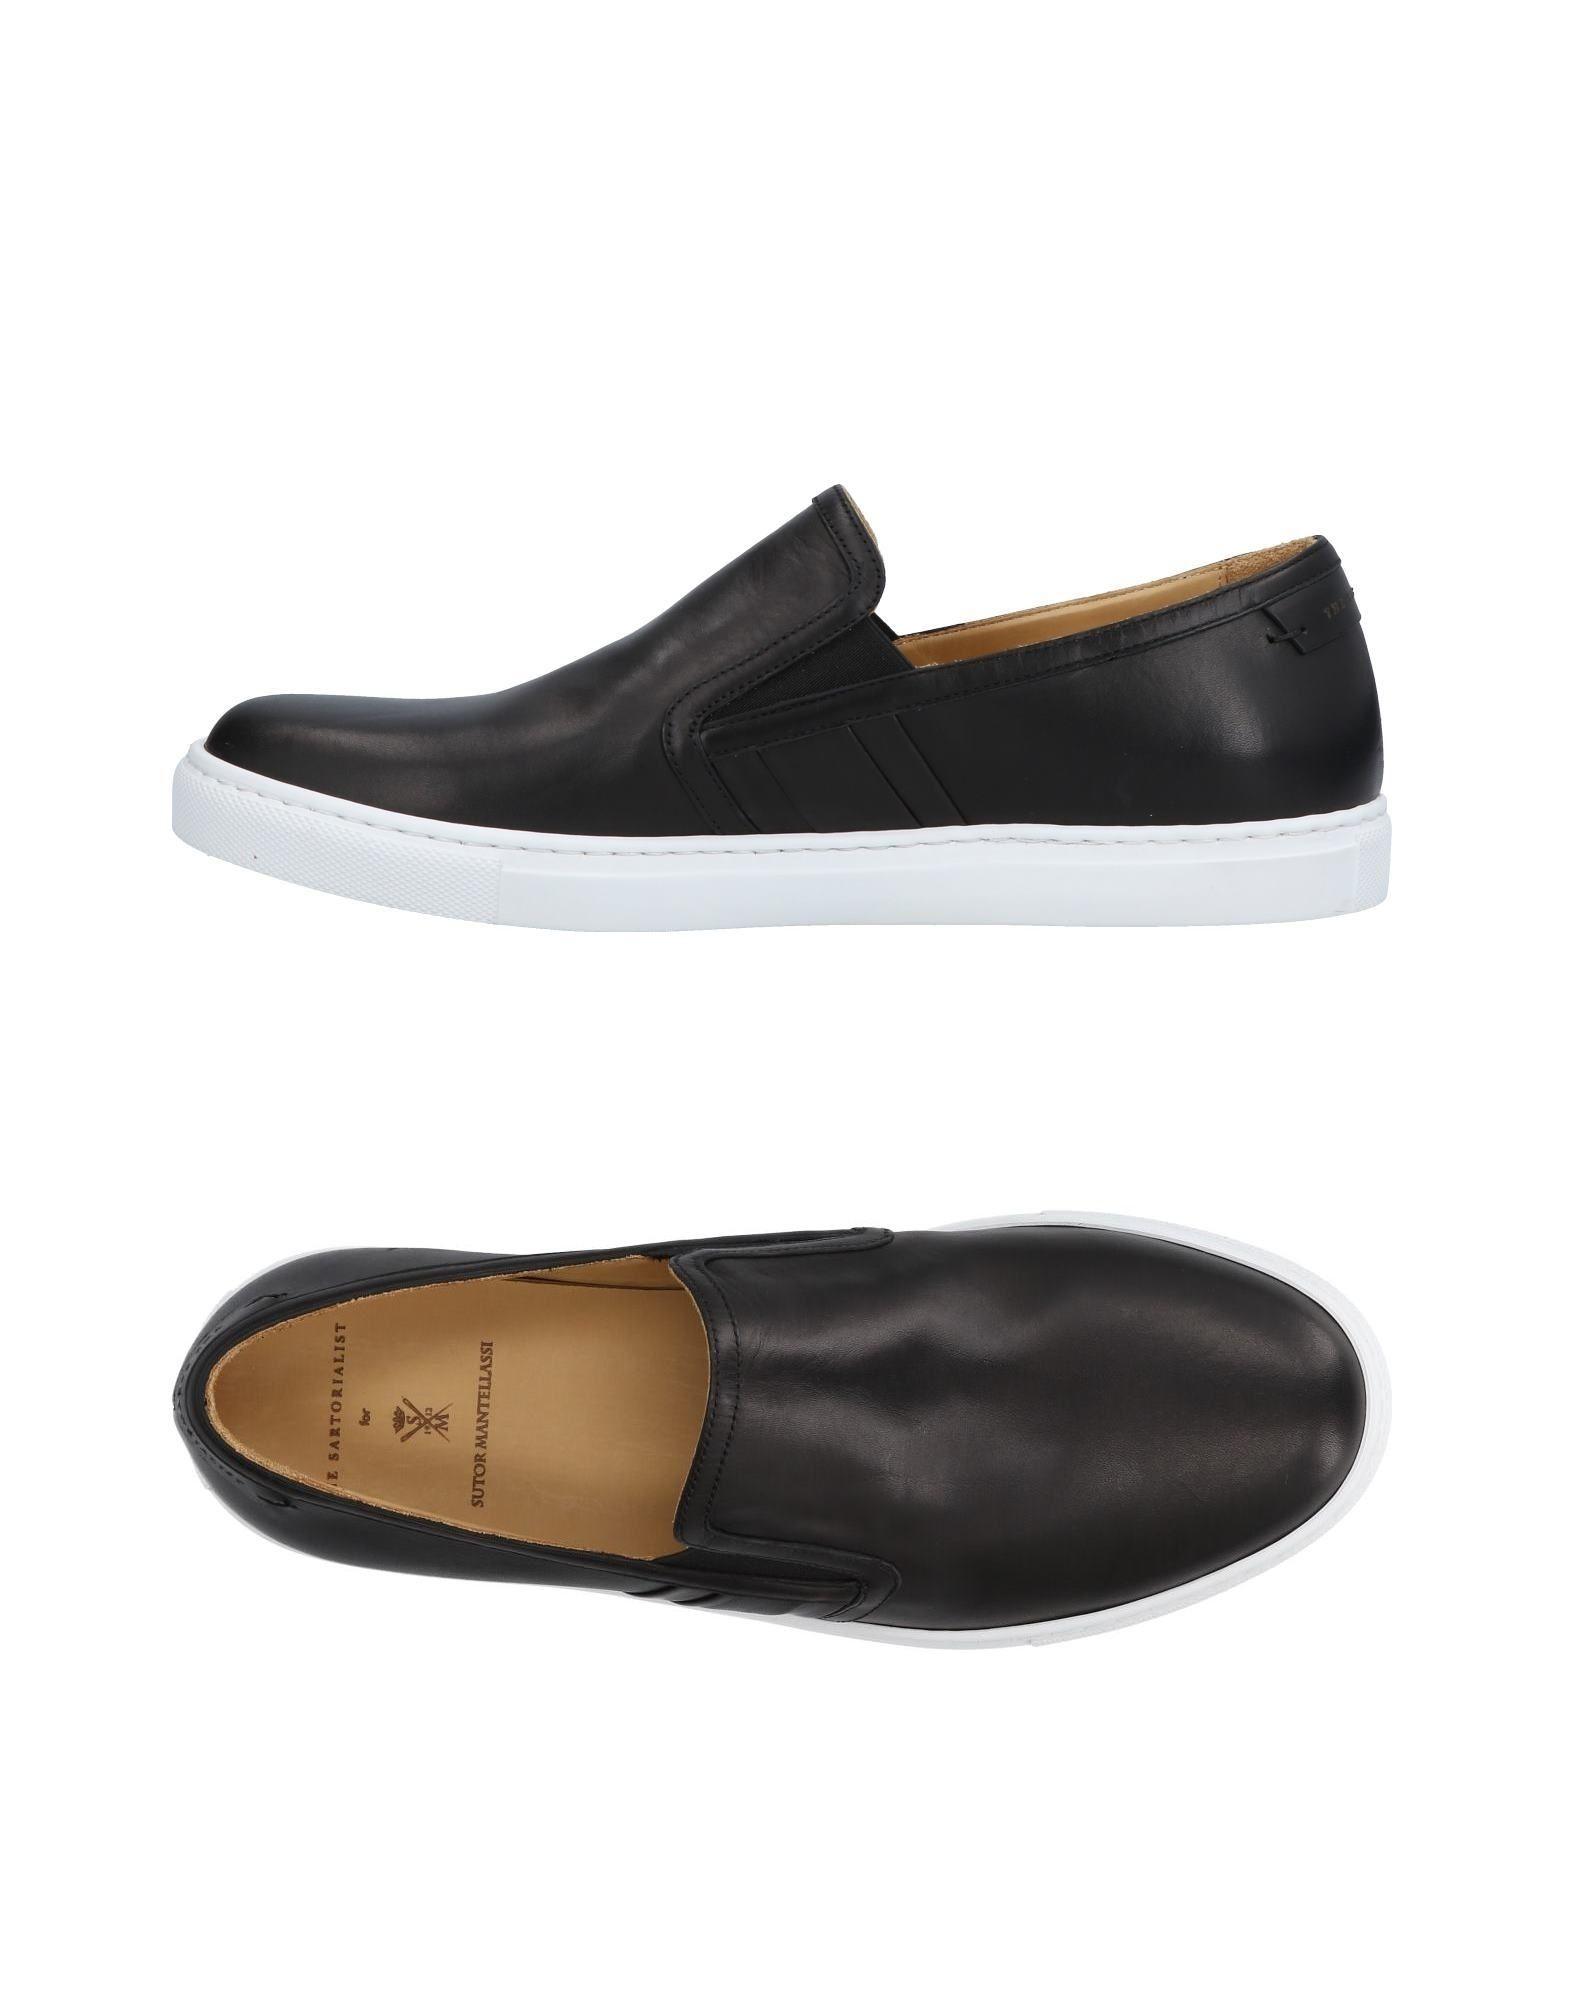 Sutor Mantellassi Sneakers Sneakers Mantellassi Herren  11472970QR Gute Qualität beliebte Schuhe 059927